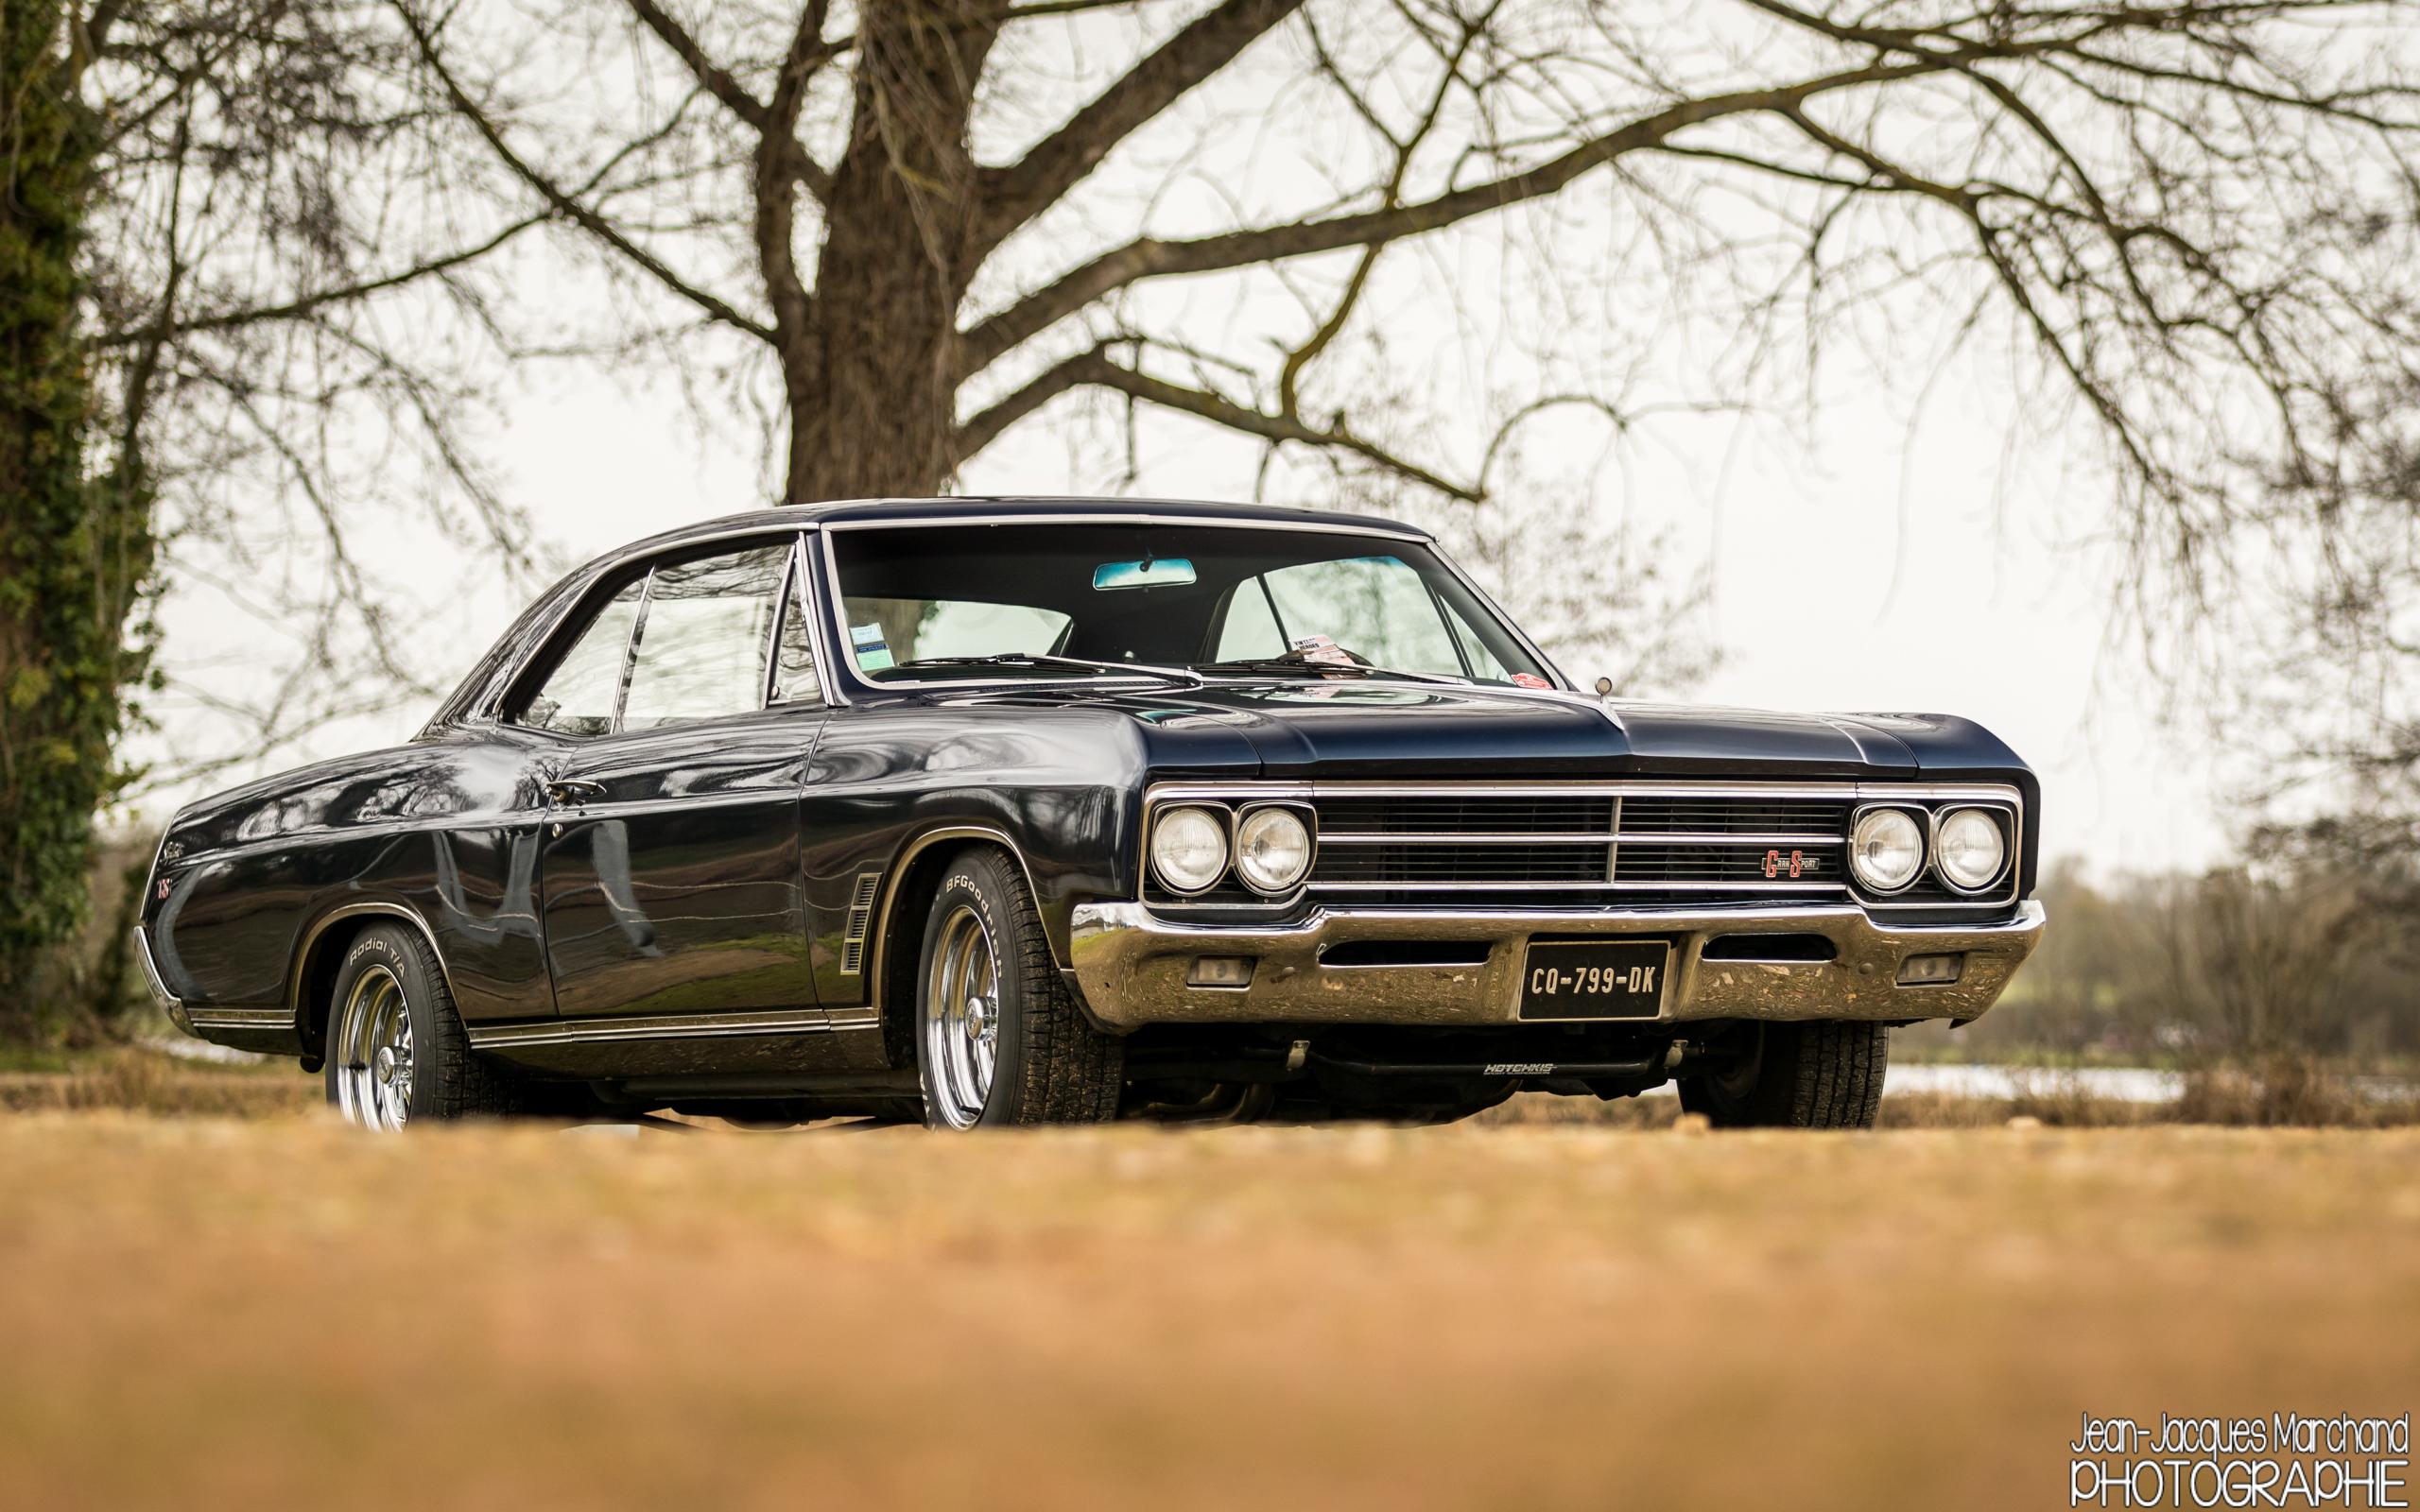 Wallpaper : auto, old, blue, cars, car, sport, america, Buick, Nikon ...